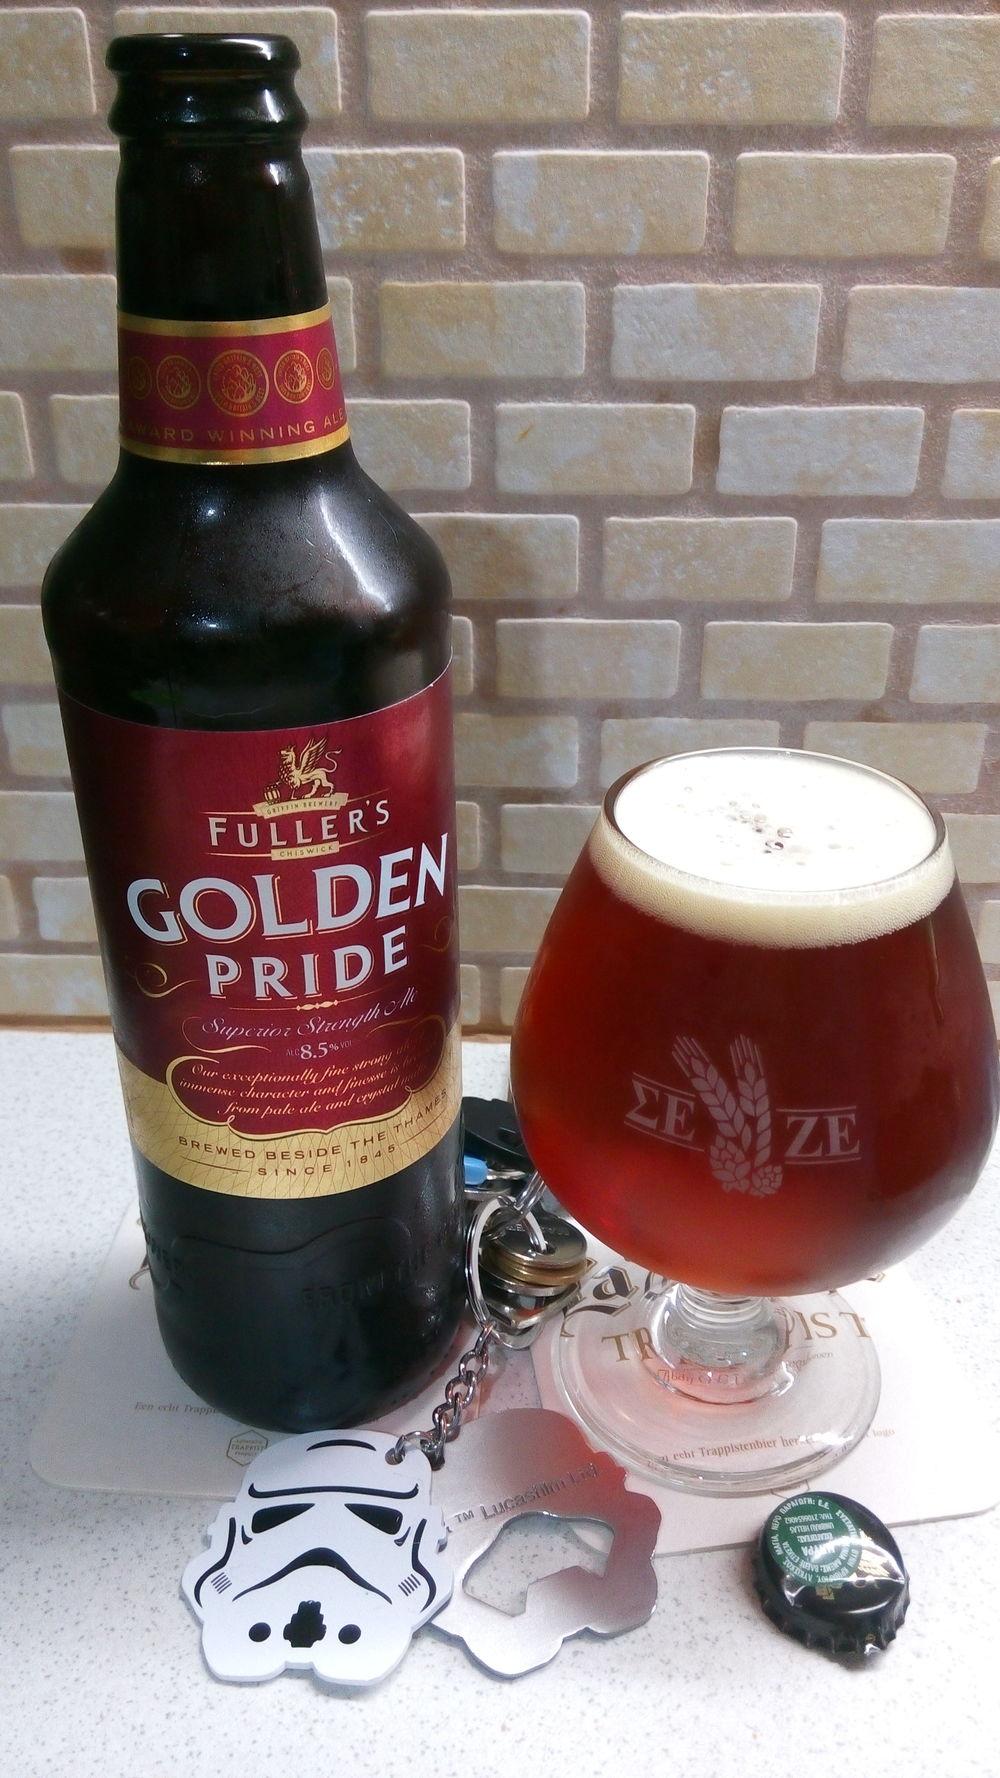 Fuller's Golden Pride 8,5% ABV